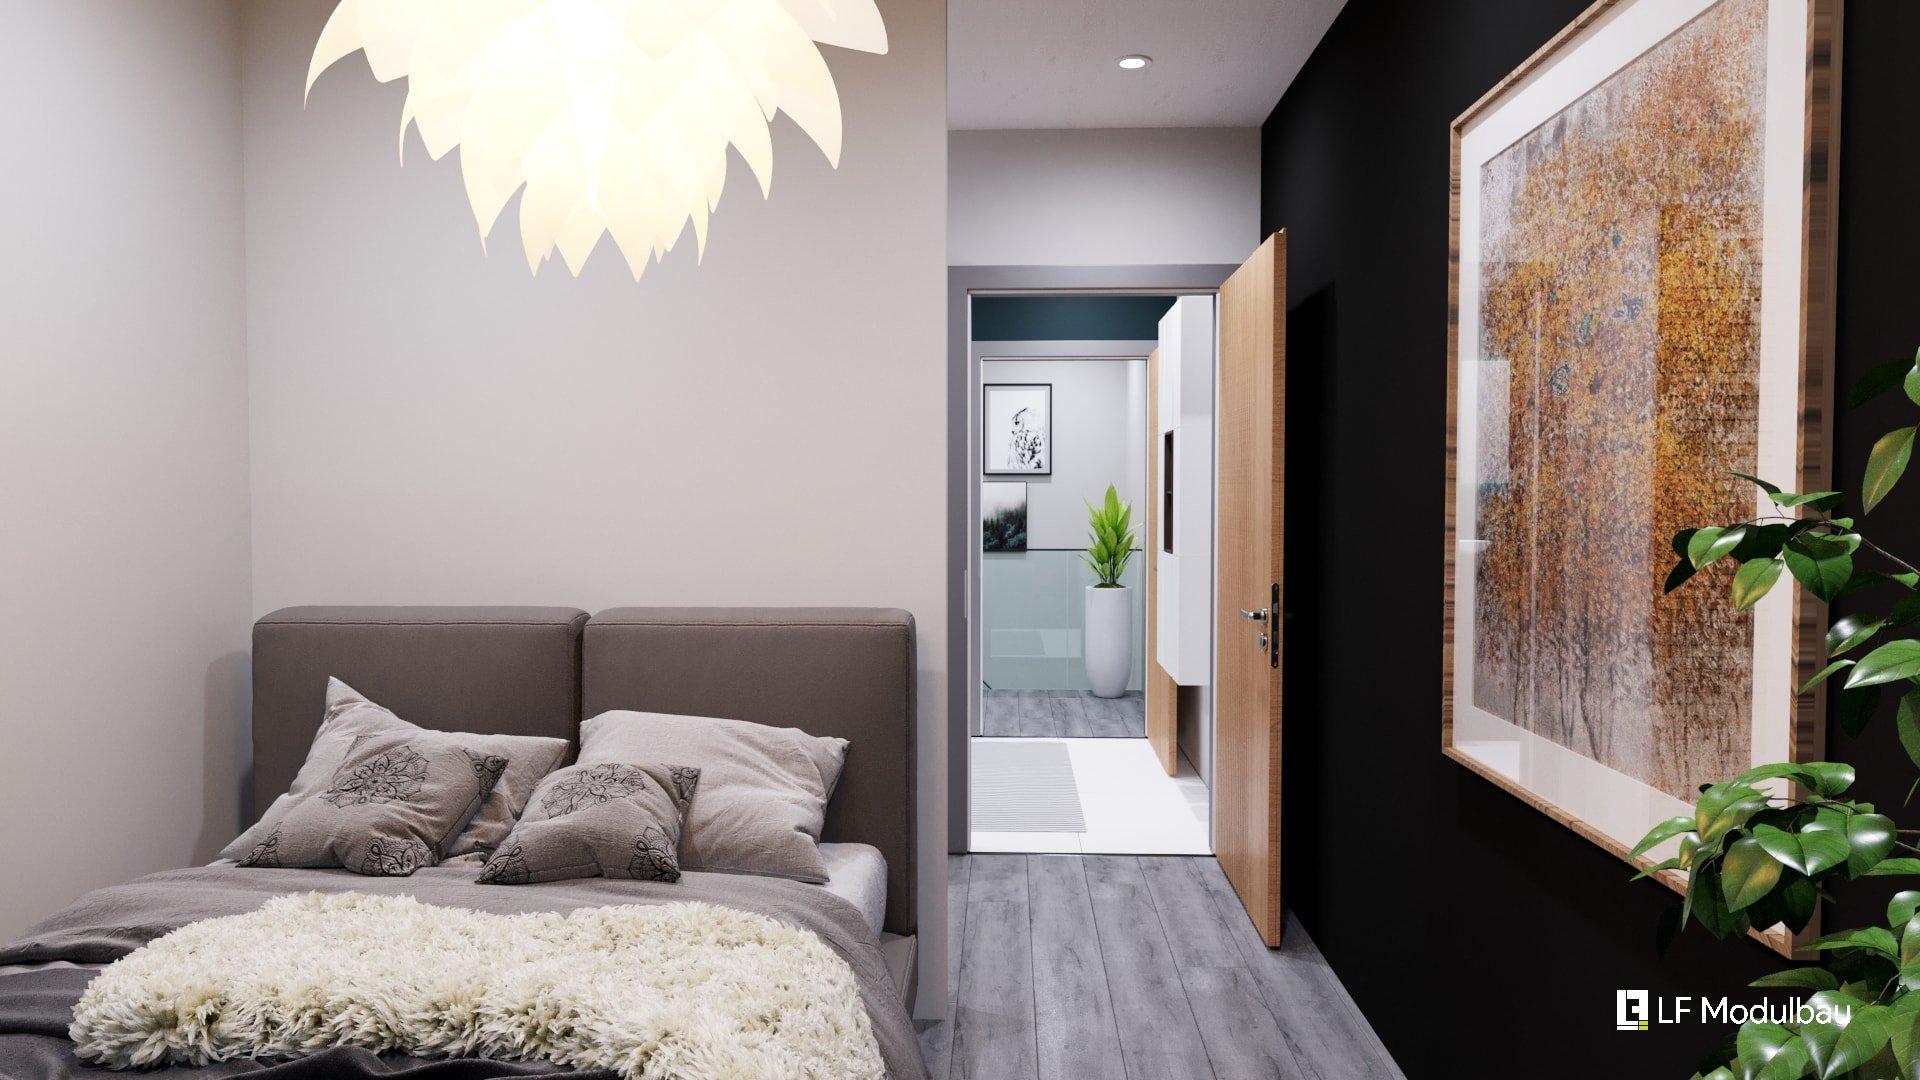 Das Schlafzimmer unseres Fertighauses in Modulbauweise - LF Home UP I Style